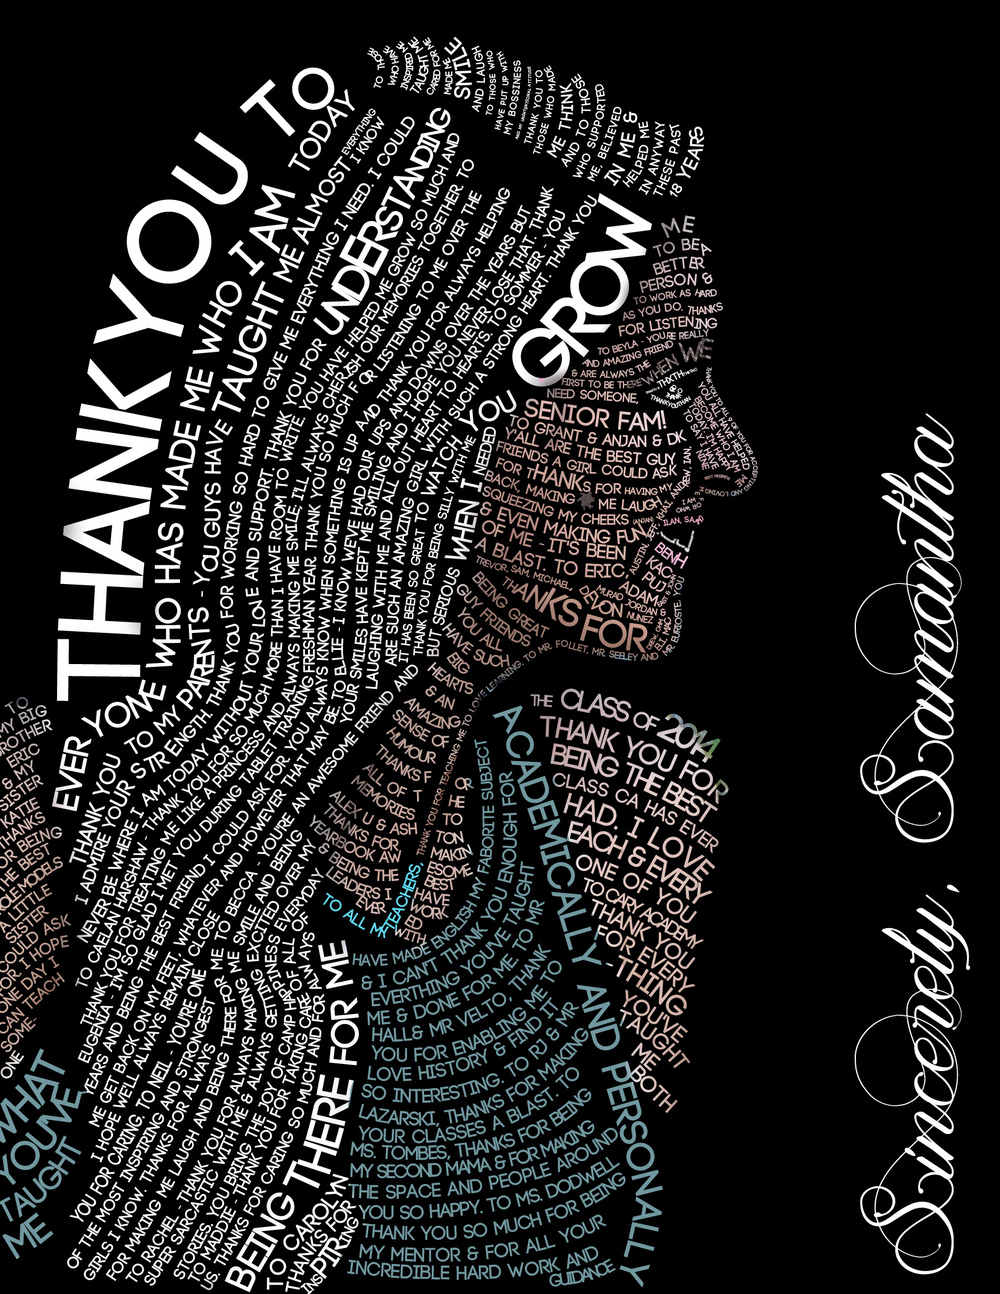 Thank You Letter Self-Portrait 2014